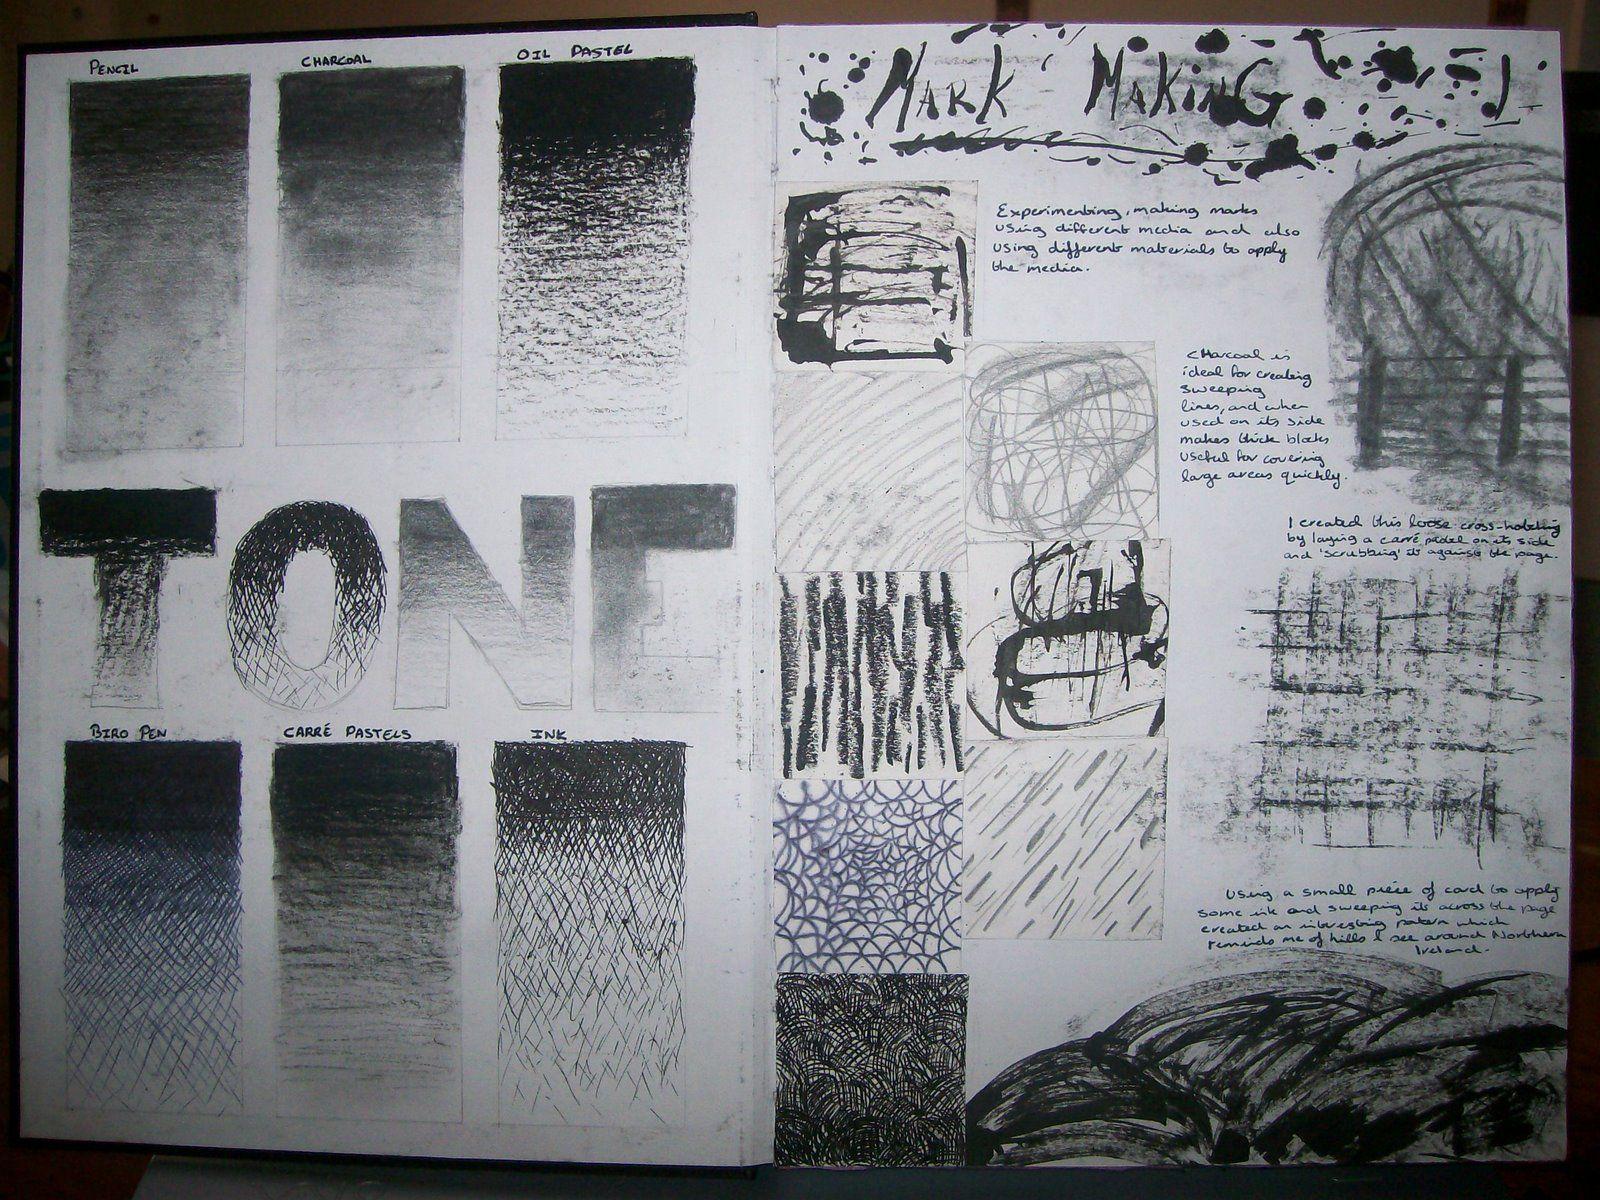 Lyzanne Markmaking Techniques